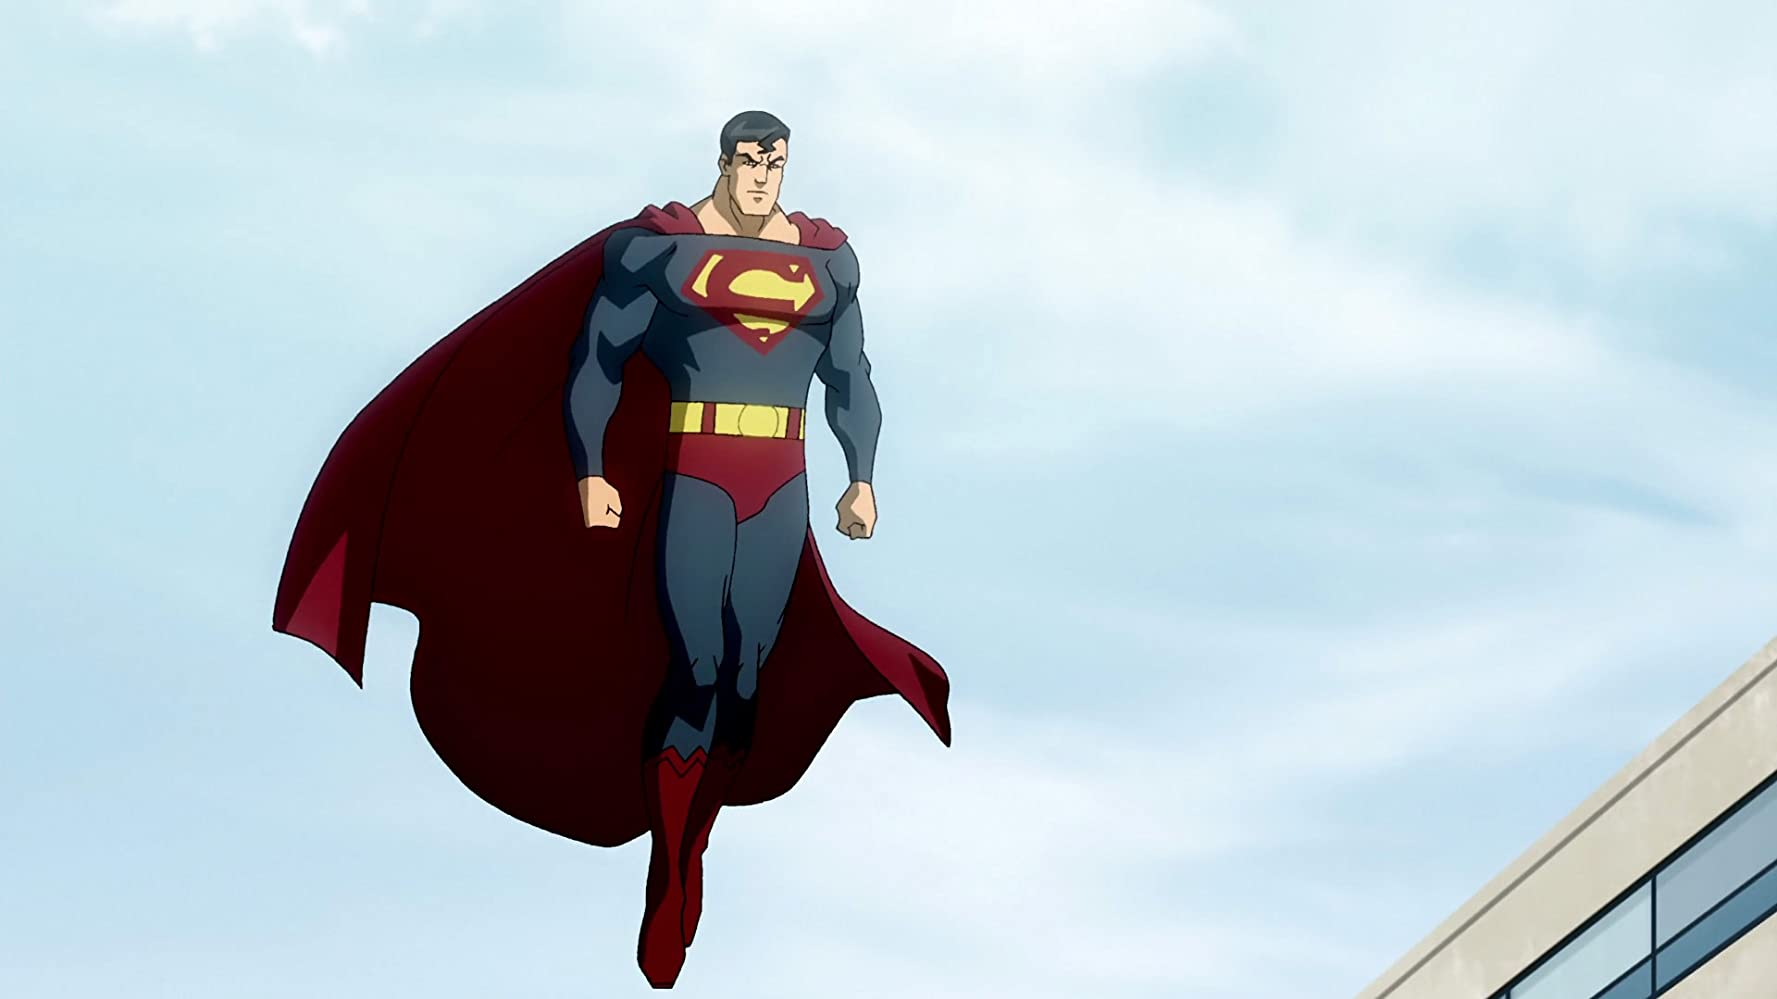 Superman Shazam The Return Of Black Adam 2010